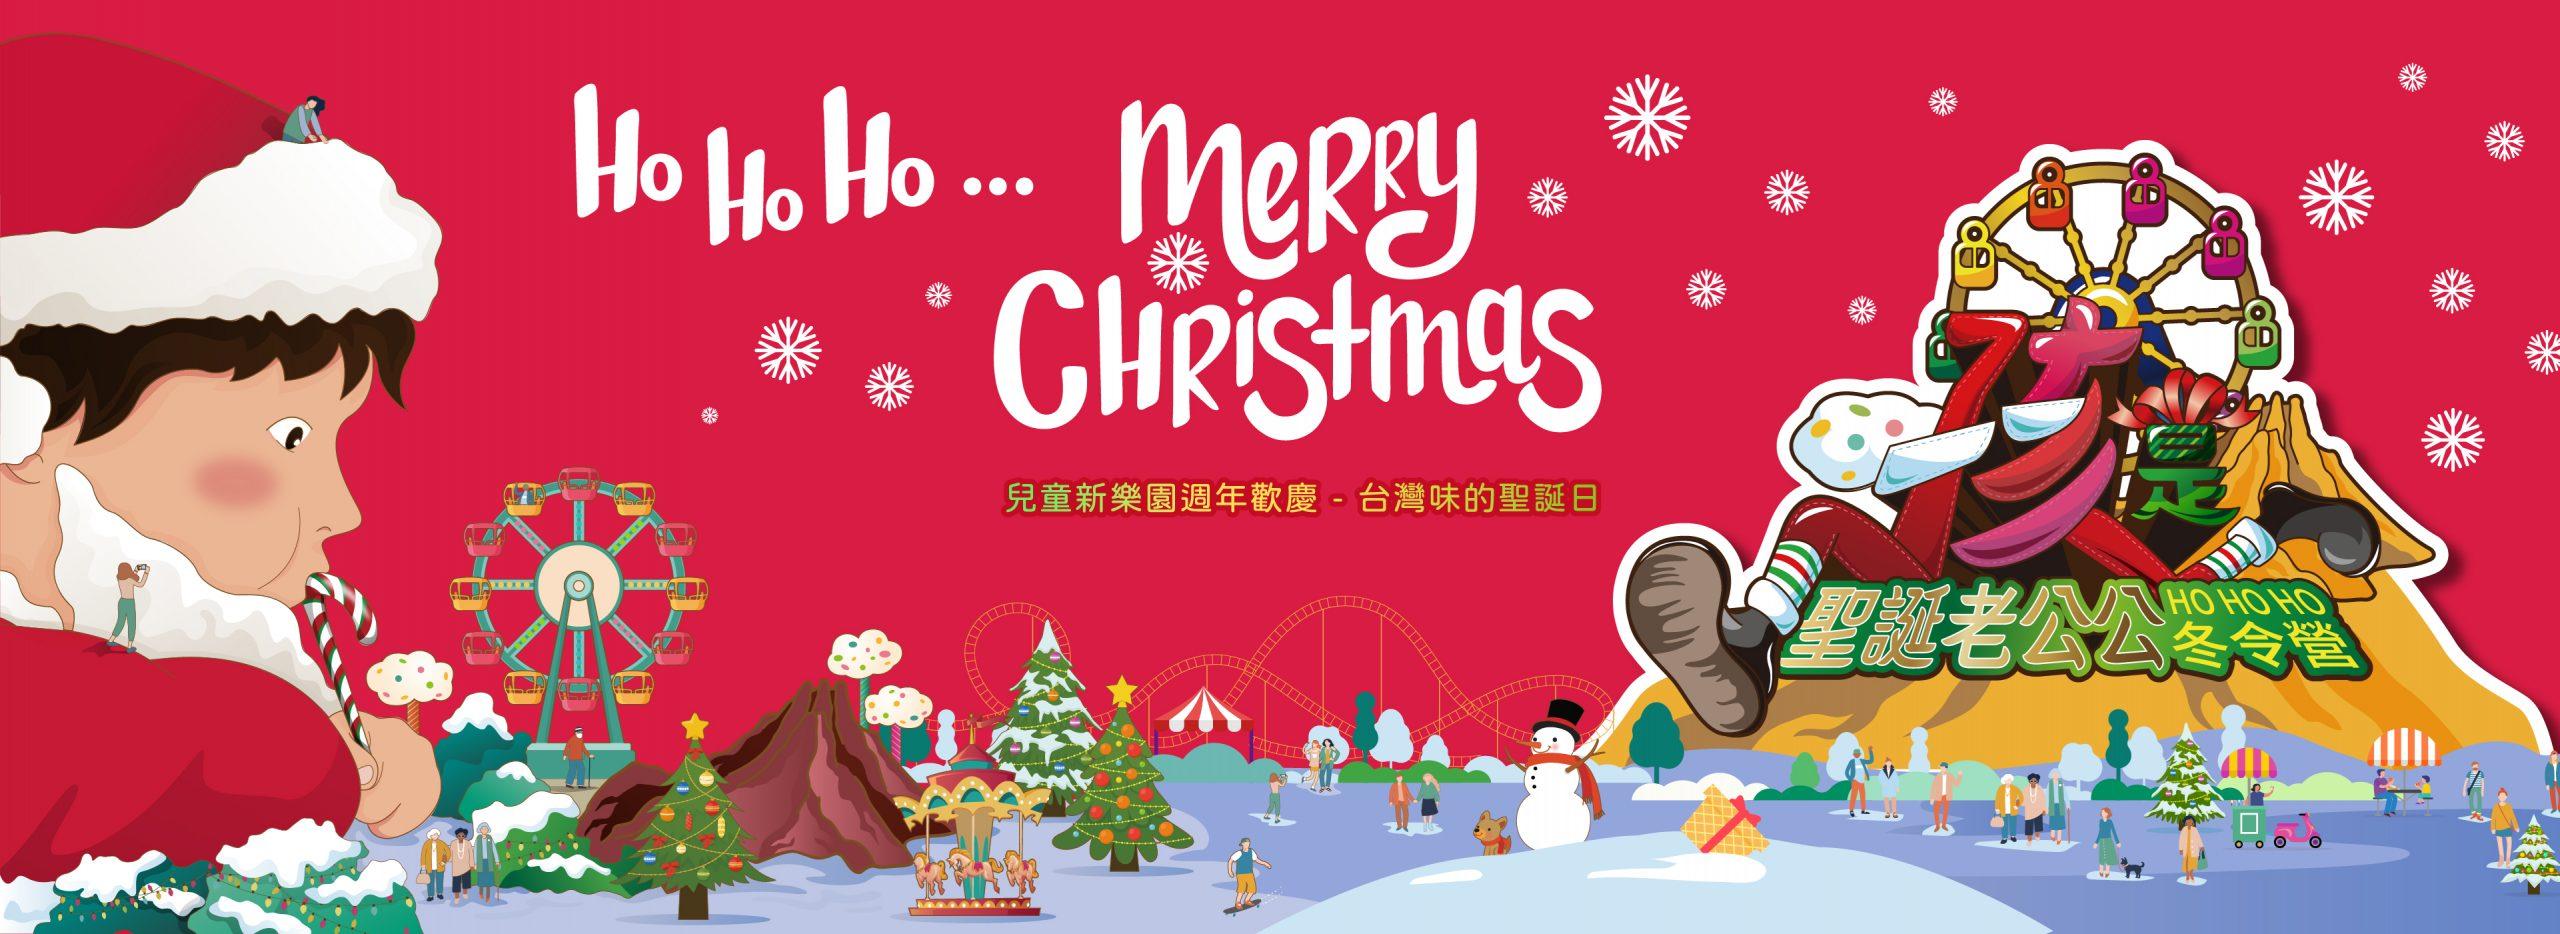 Banner - Hohoho Merry Christmas